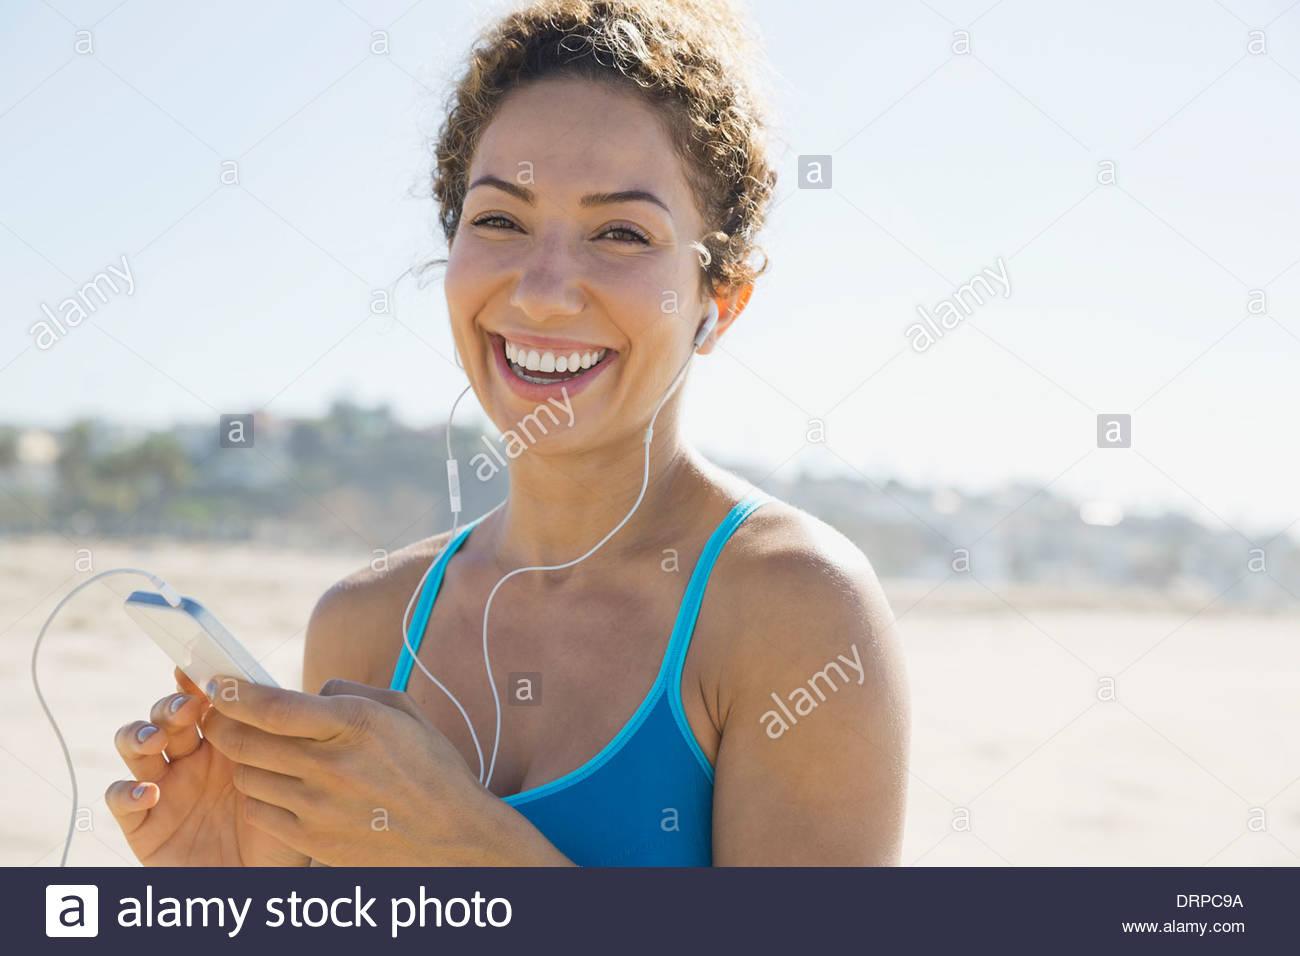 Portrait de femme active listening to music at beach Photo Stock